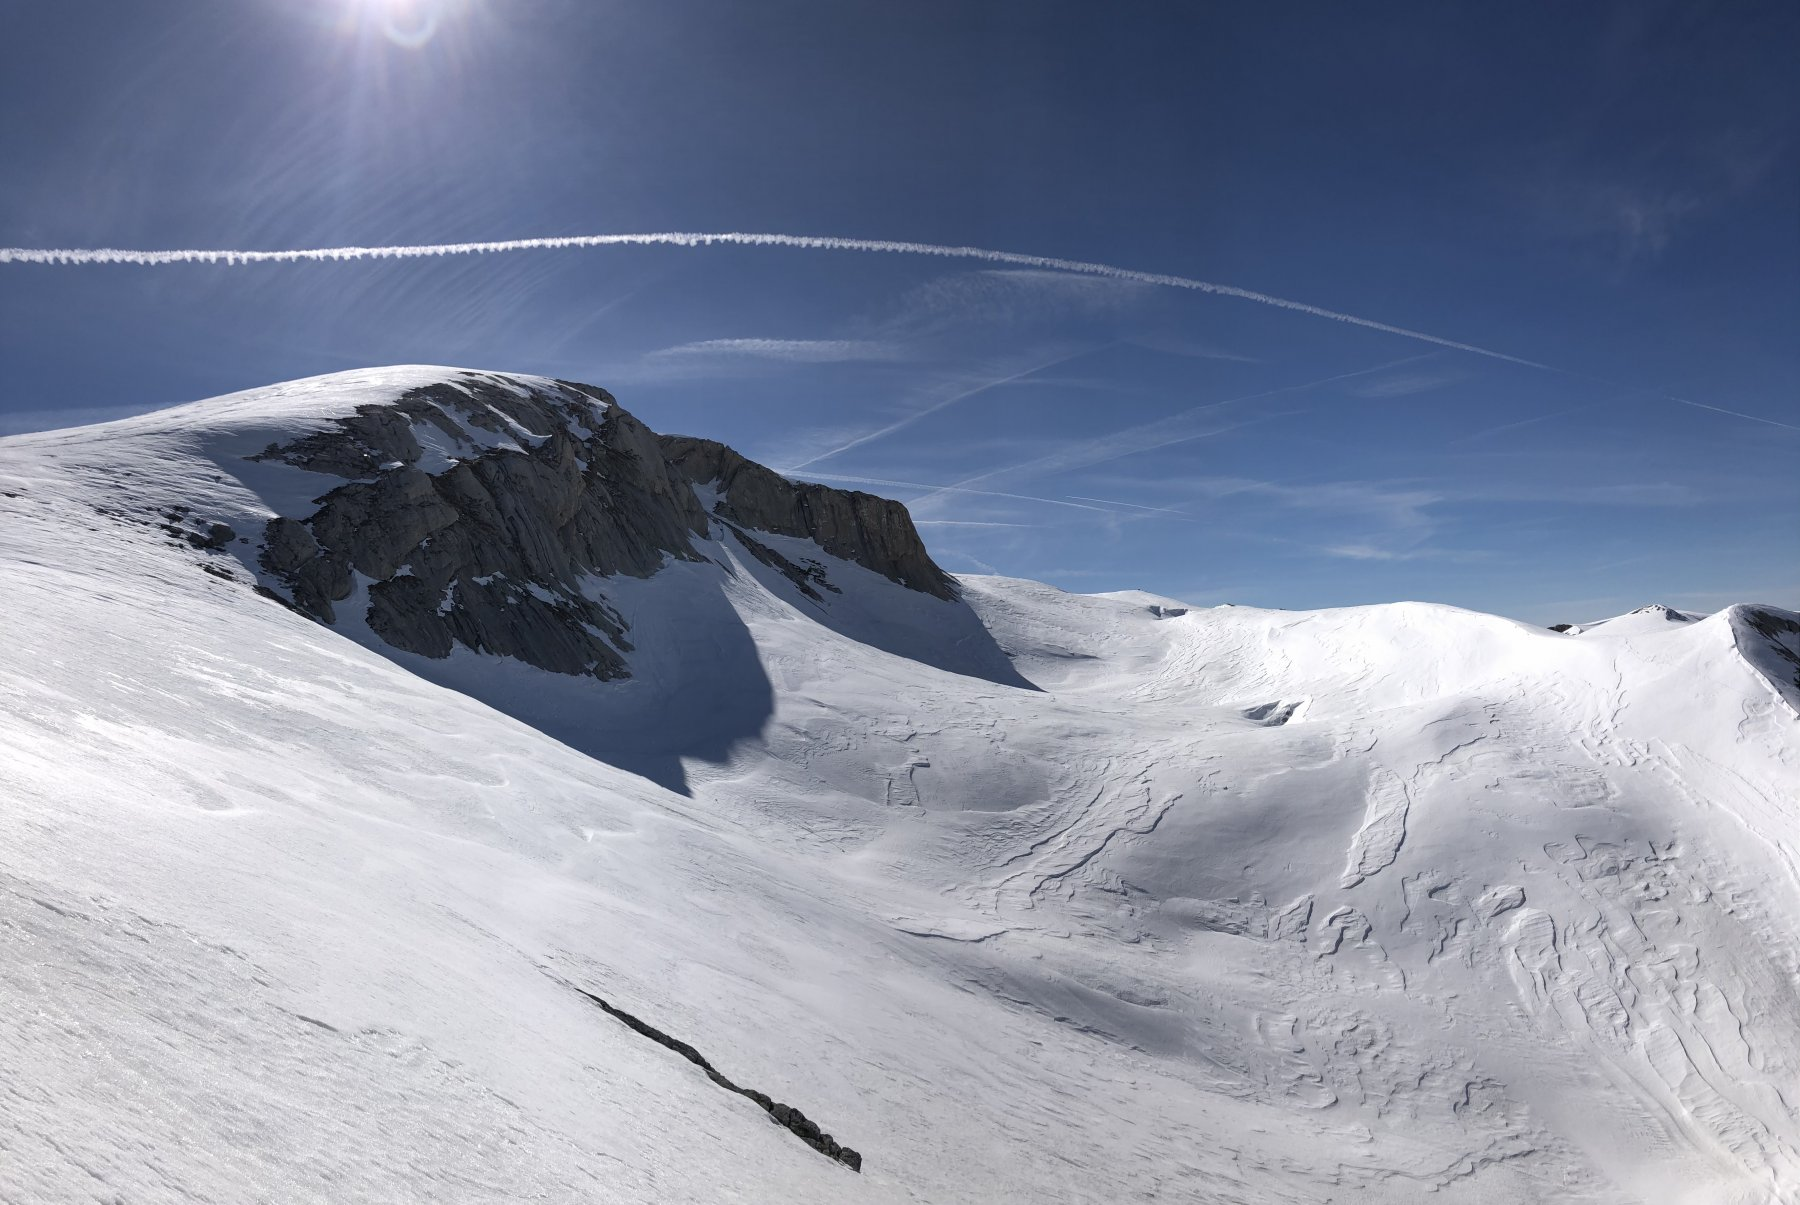 Mongioie (Monte) da Artesina 2020-03-13